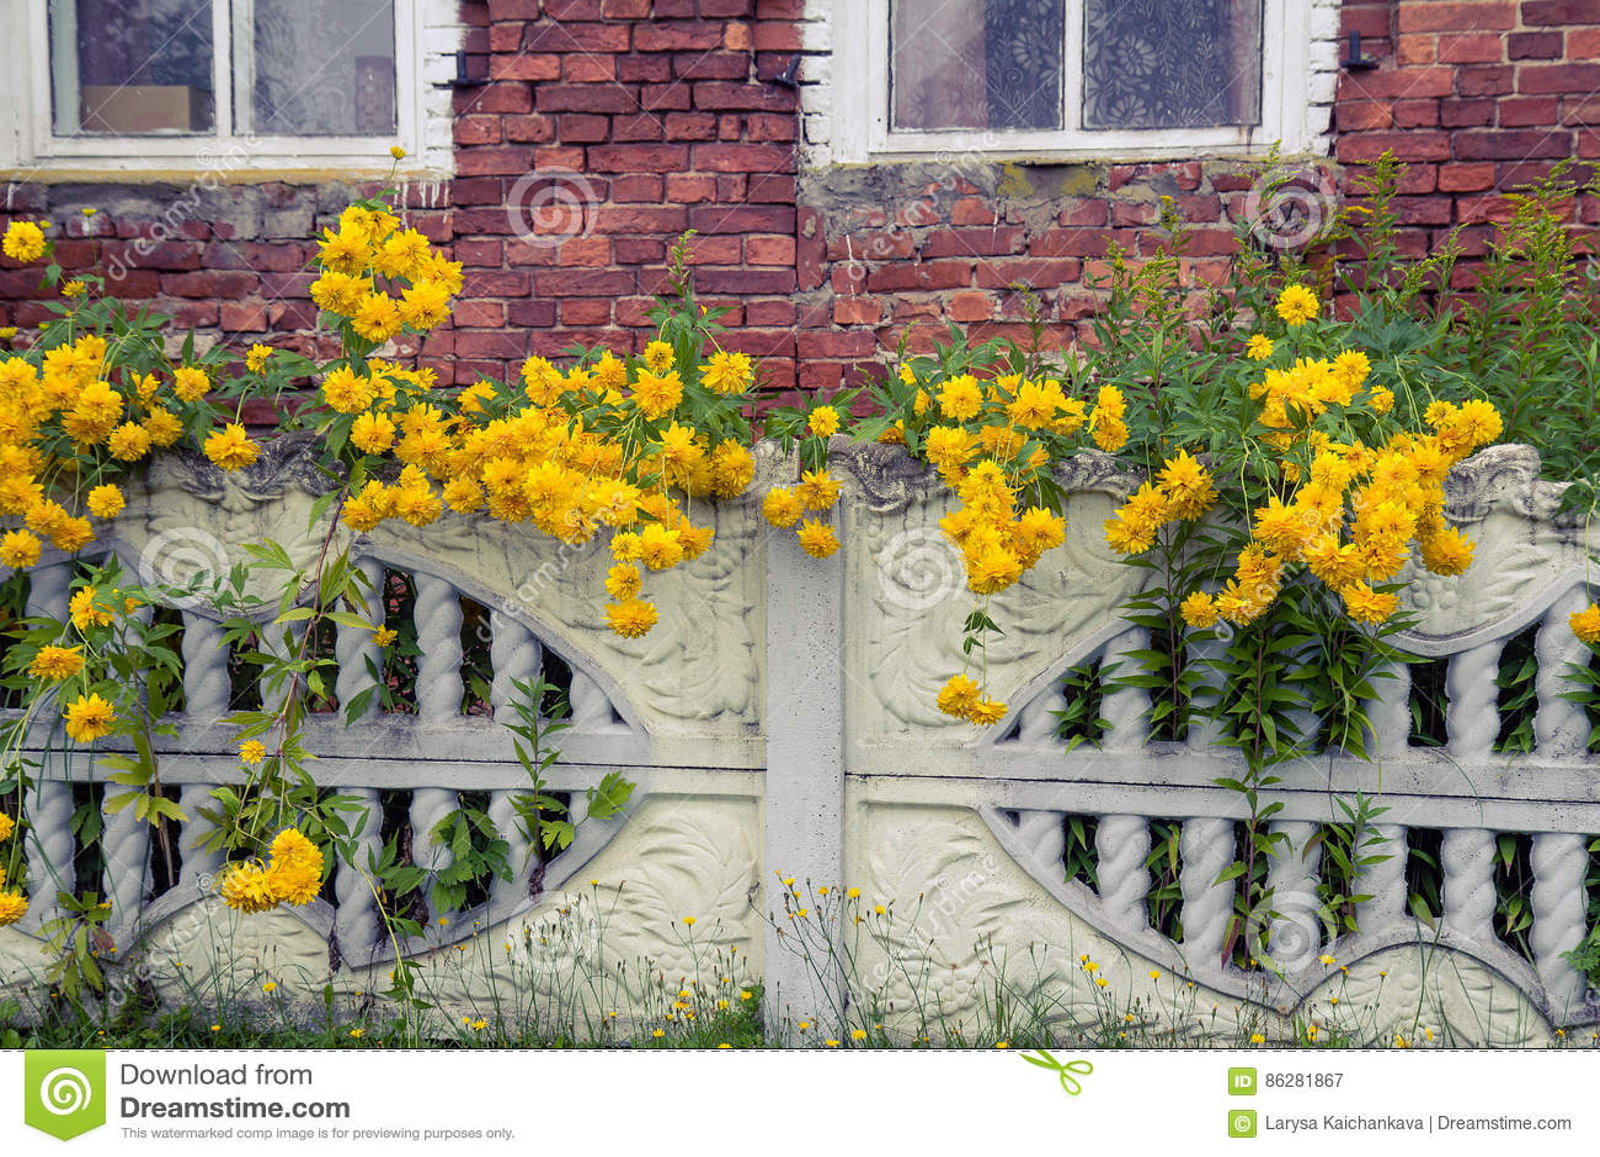 Yellow flowers in balls near the fence stock illustration download yellow flowers in balls near the fence stock illustration illustration of closeup mightylinksfo